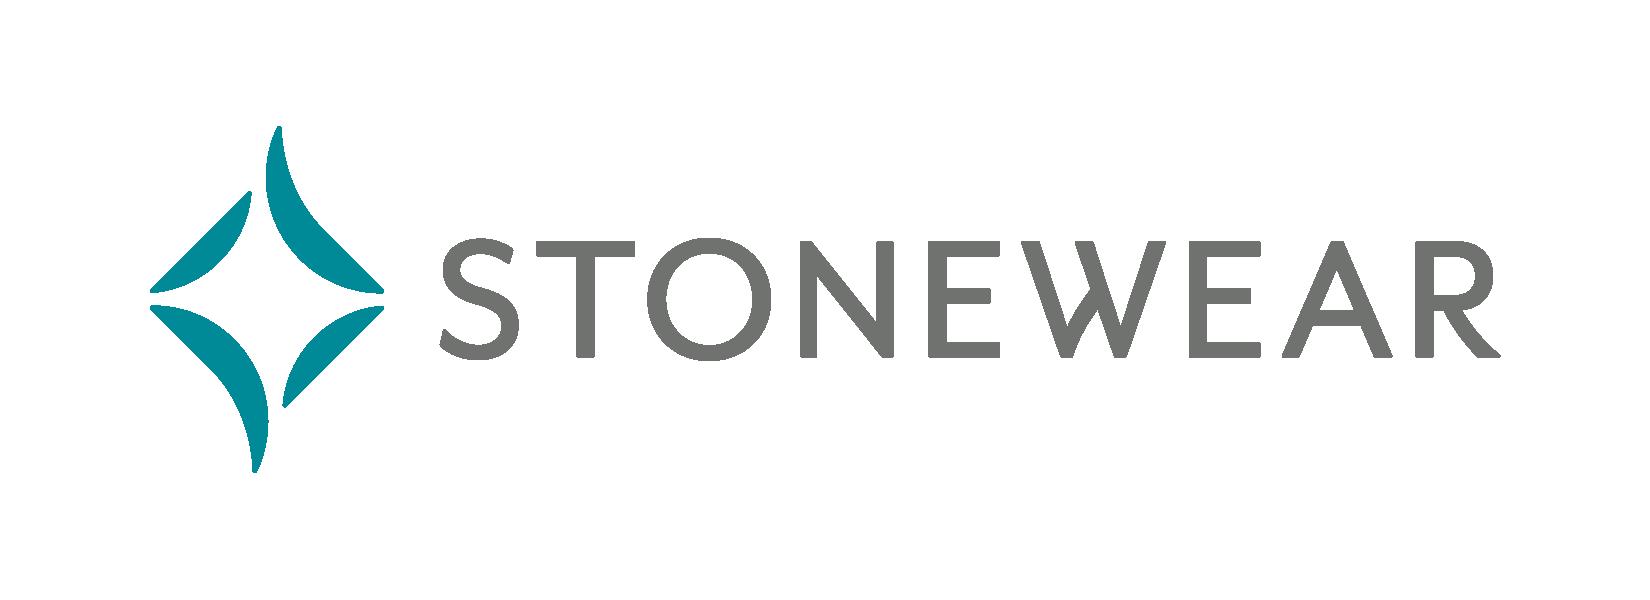 stonewear horizontal logo